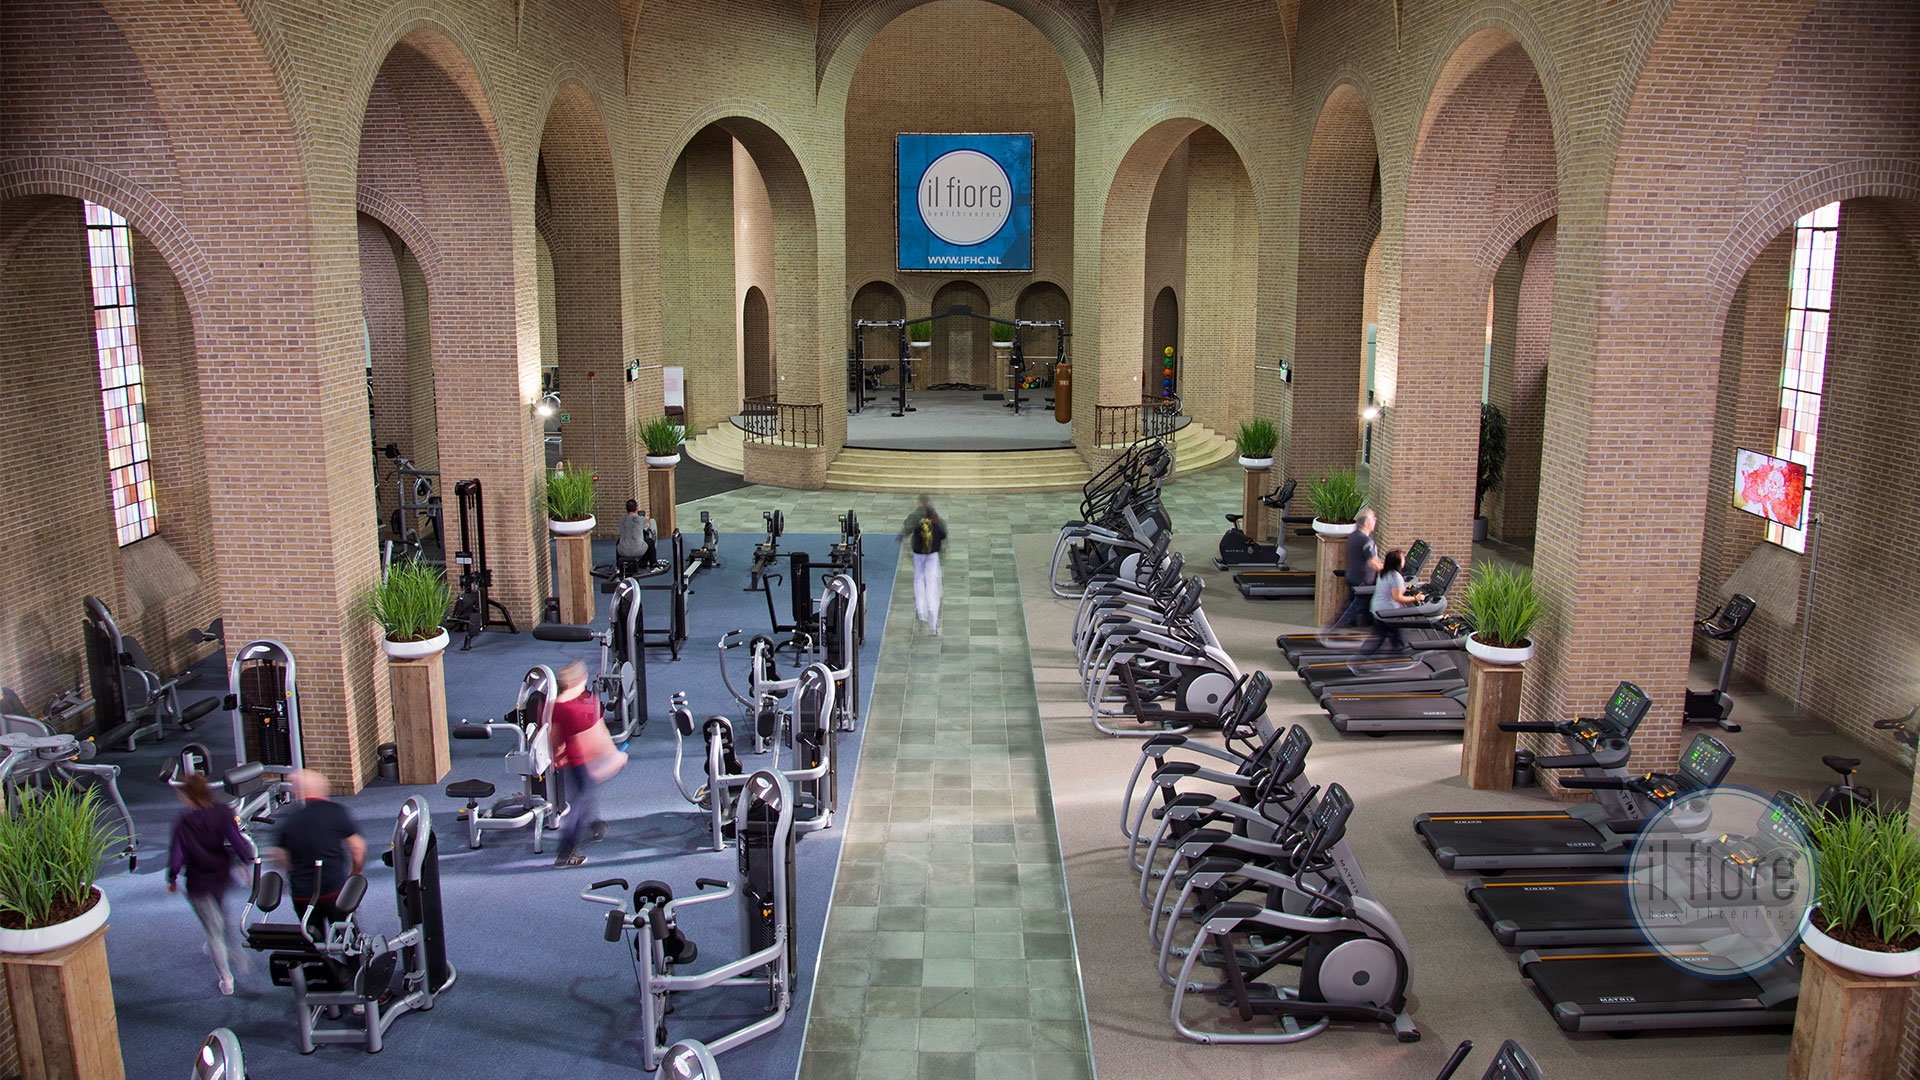 il fiore gym inside a church